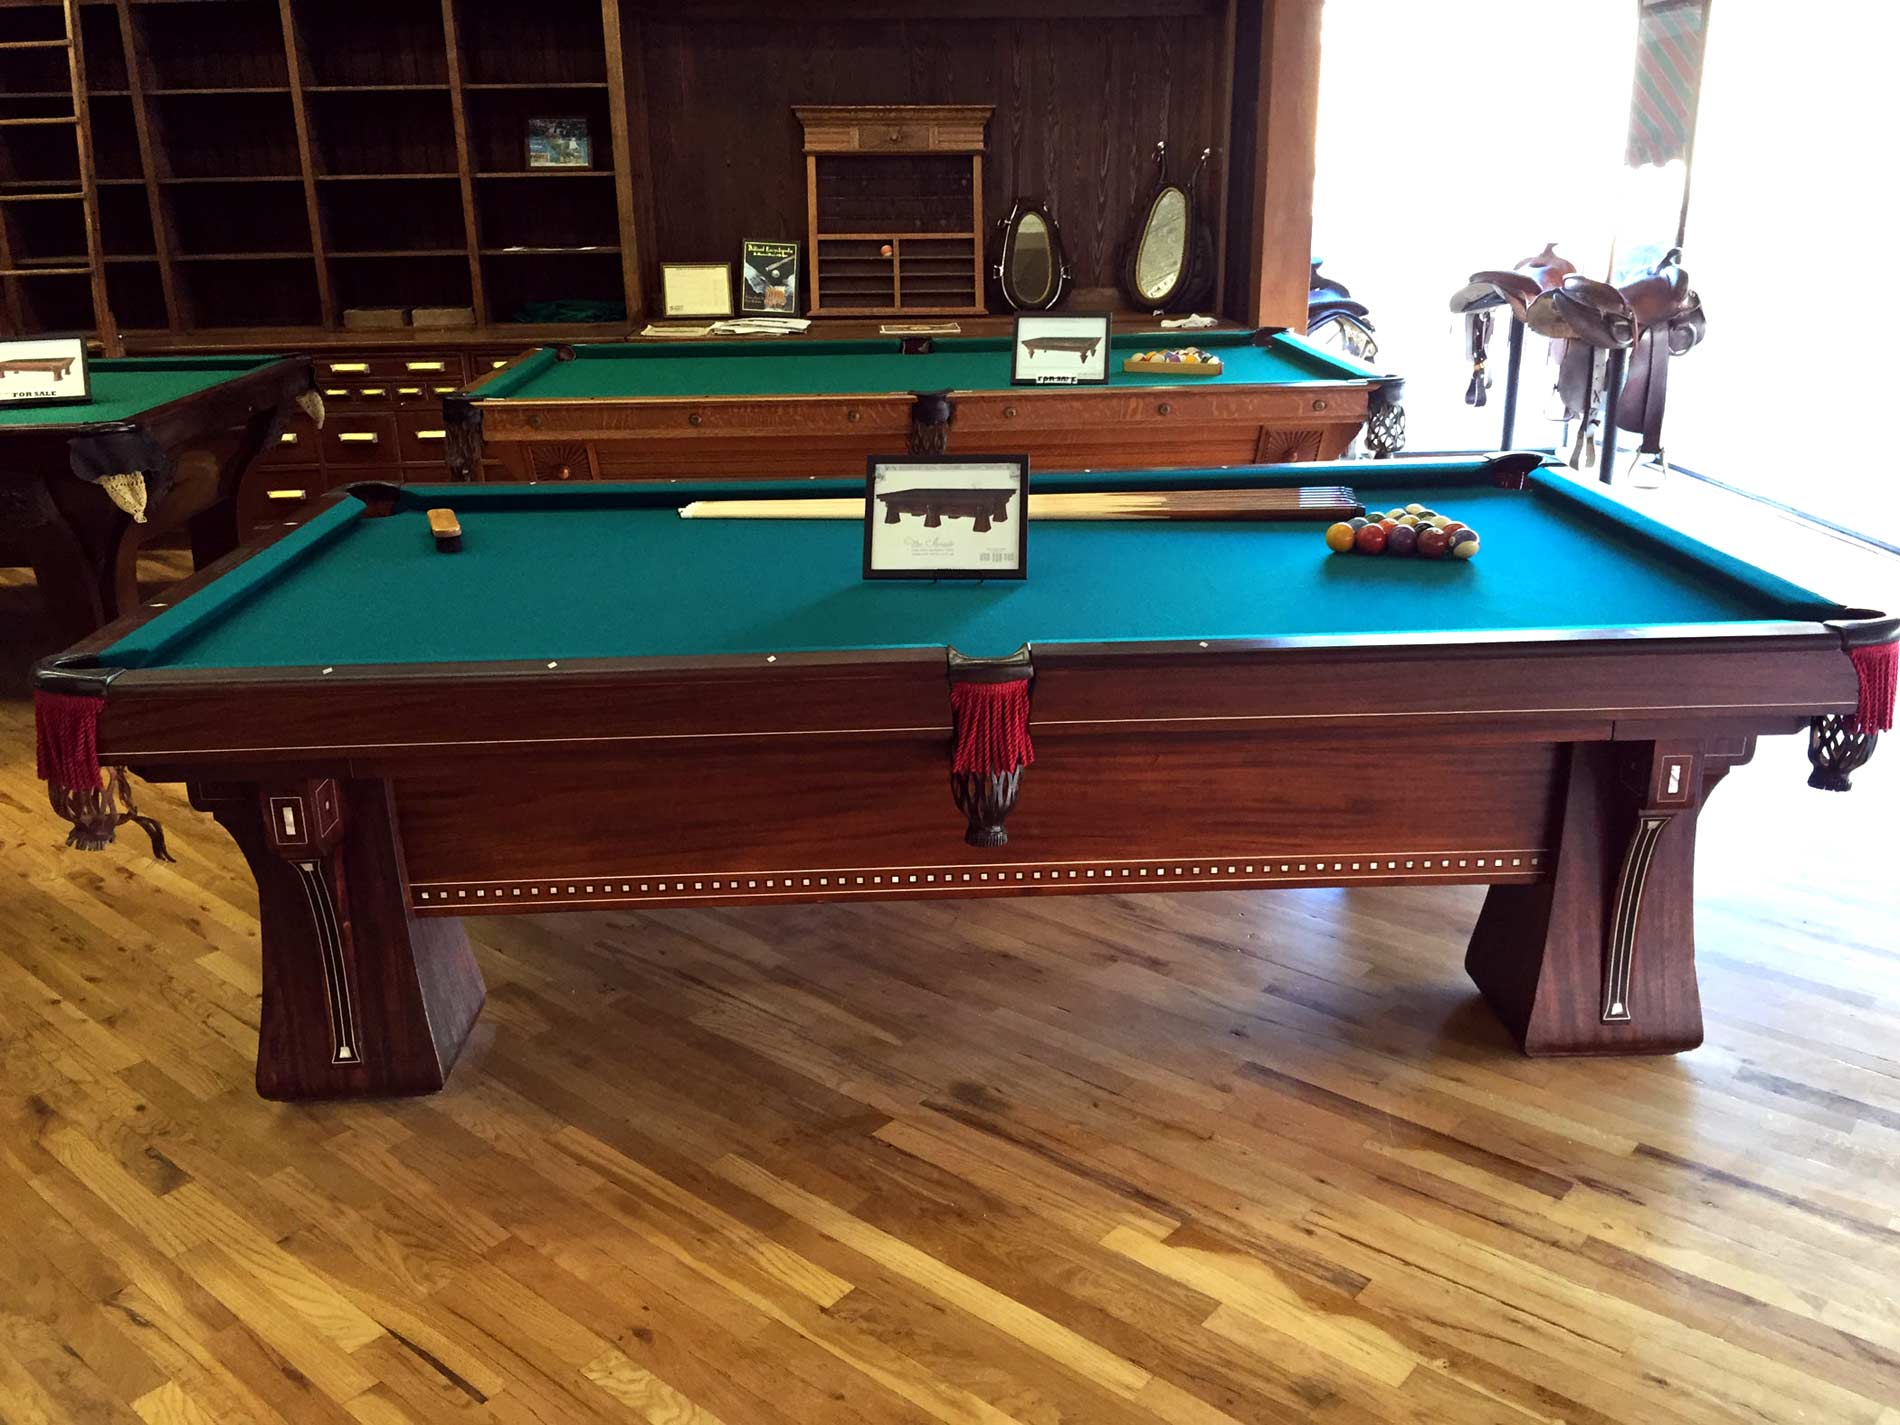 Cowboy Billiards The Arcade Antique Brunswick Pool Table - Old brunswick pool table